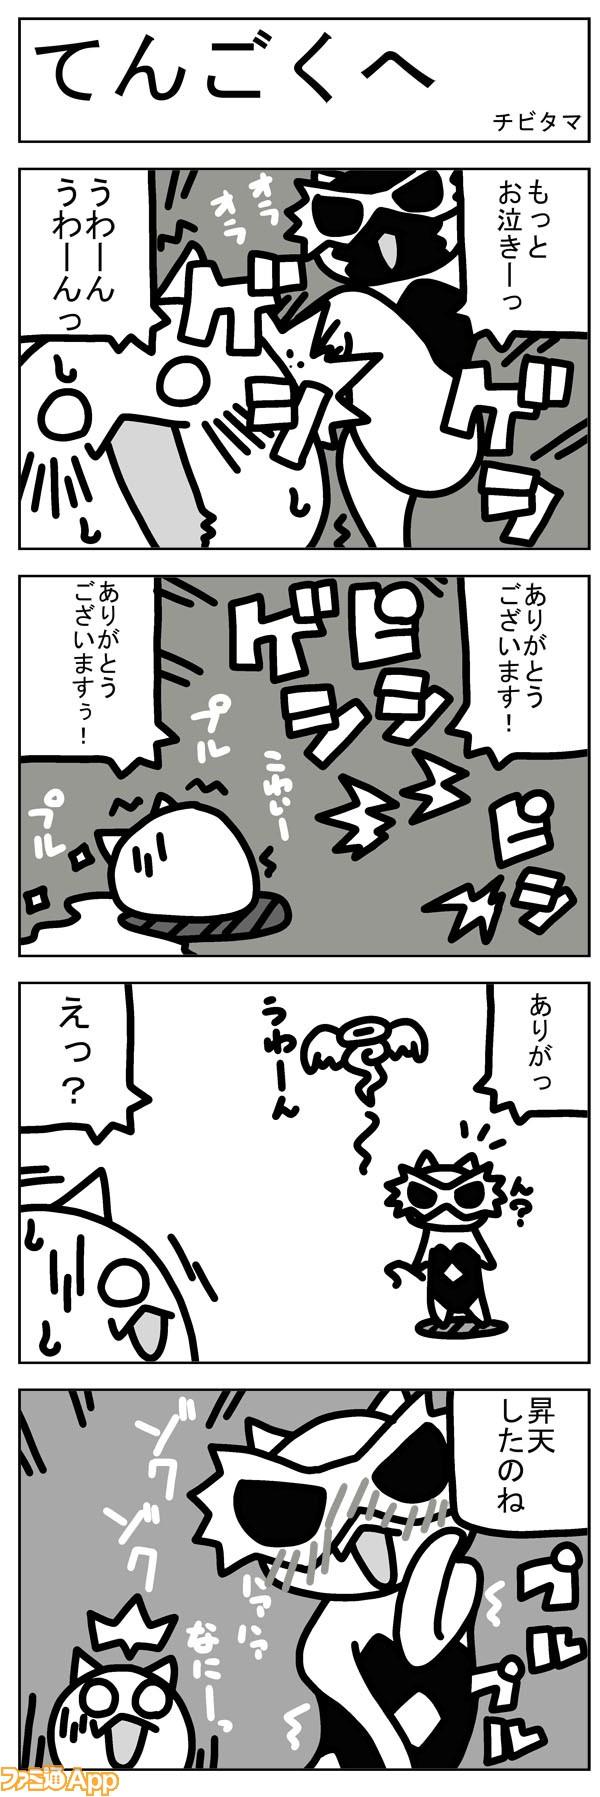 13tibi_006